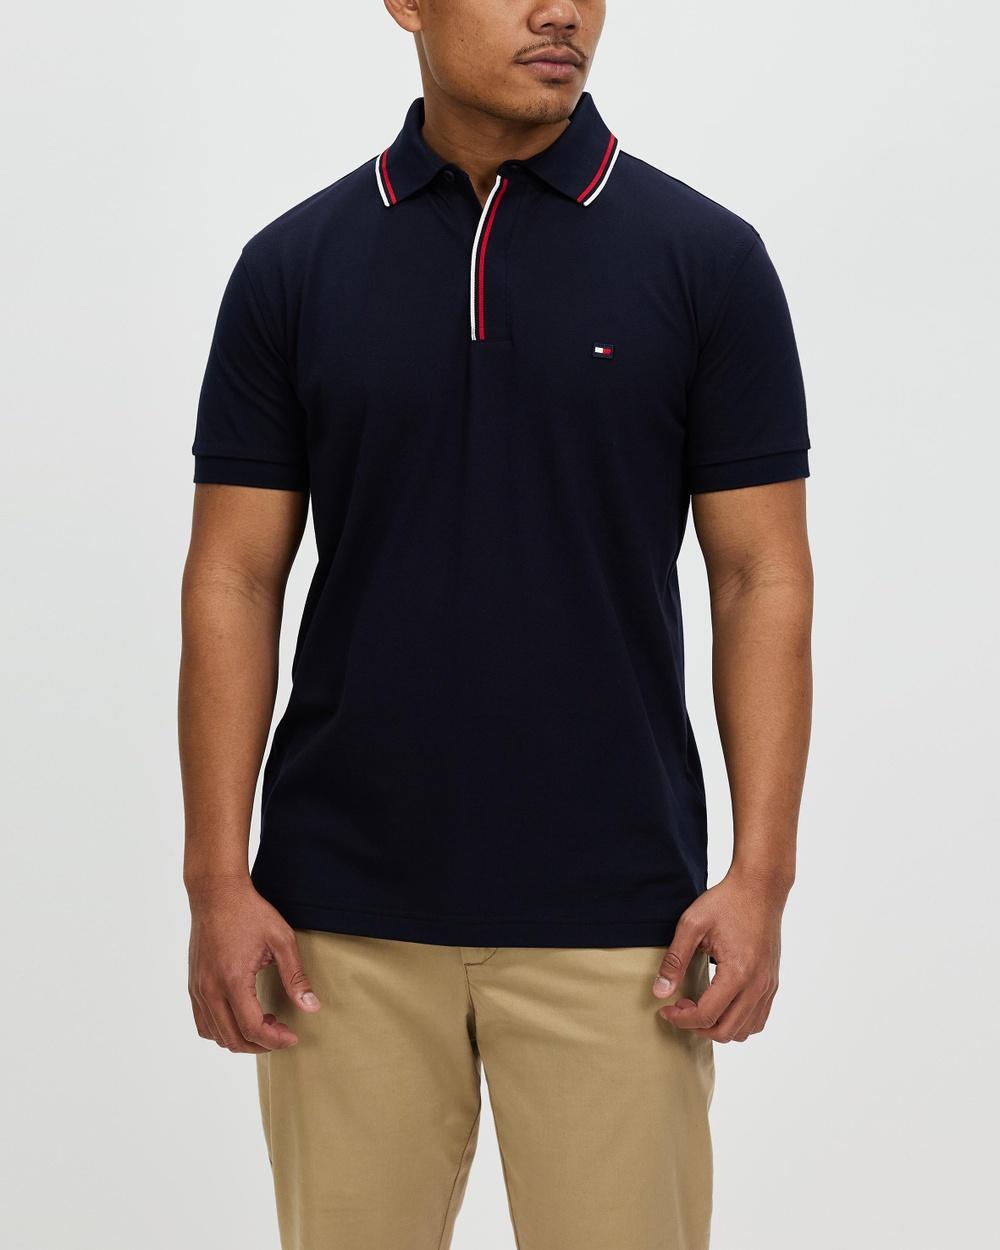 Tommy Hilfiger WCC Branded Regular Polo Shirts & Polos Desert Sky Australia